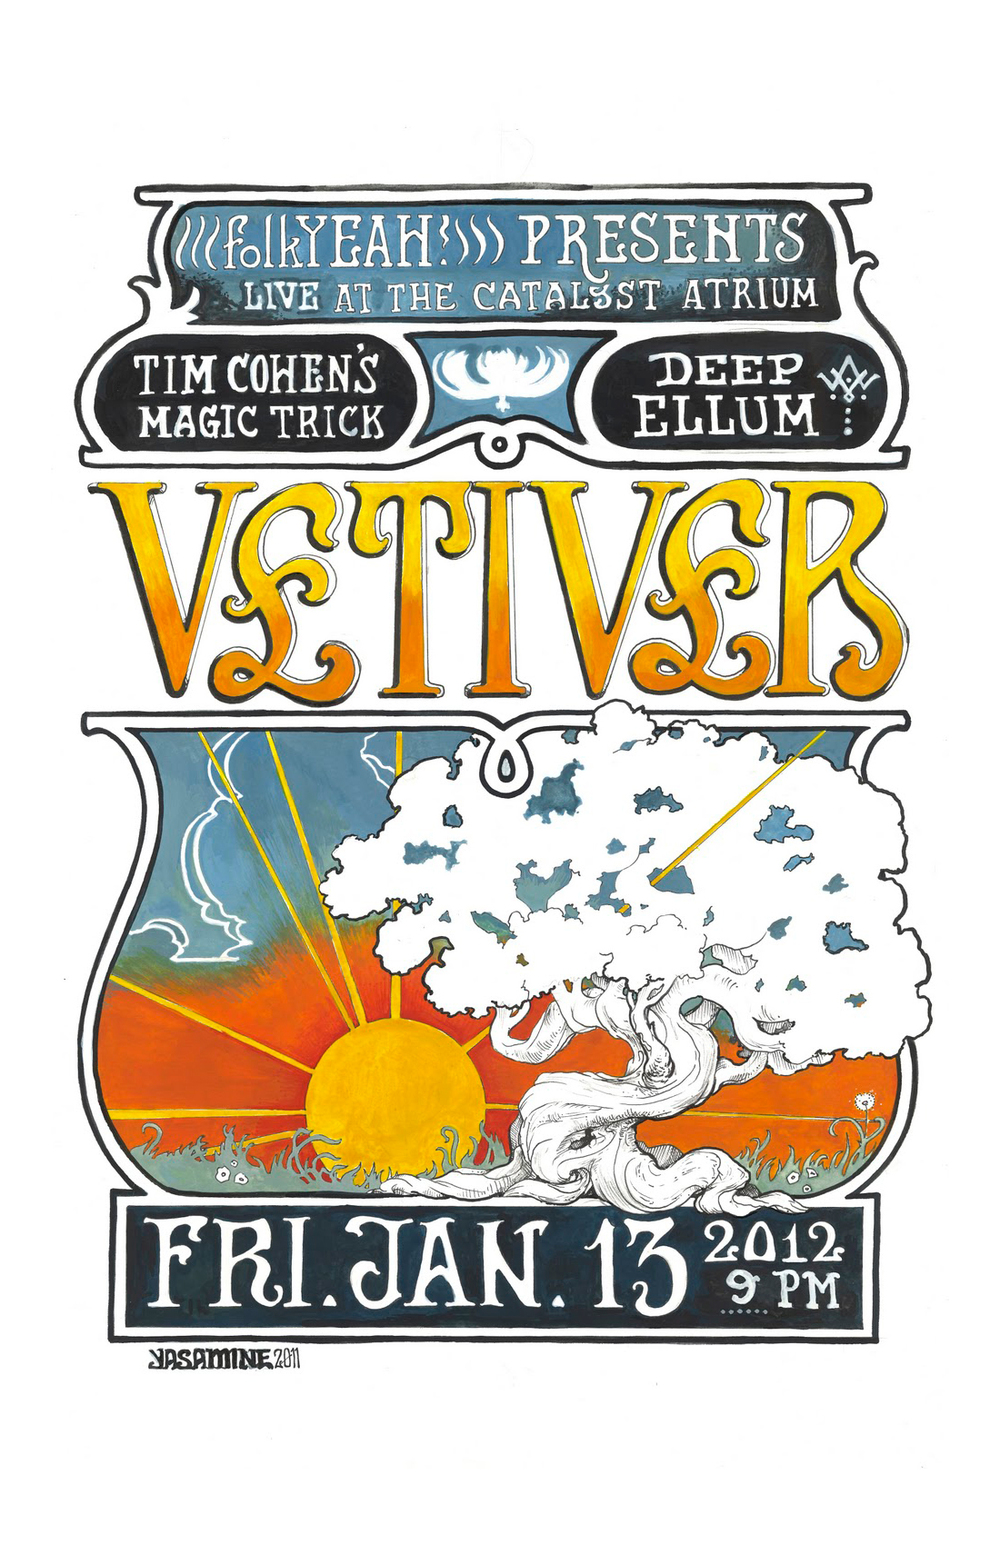 Concert Poster for Vetiver